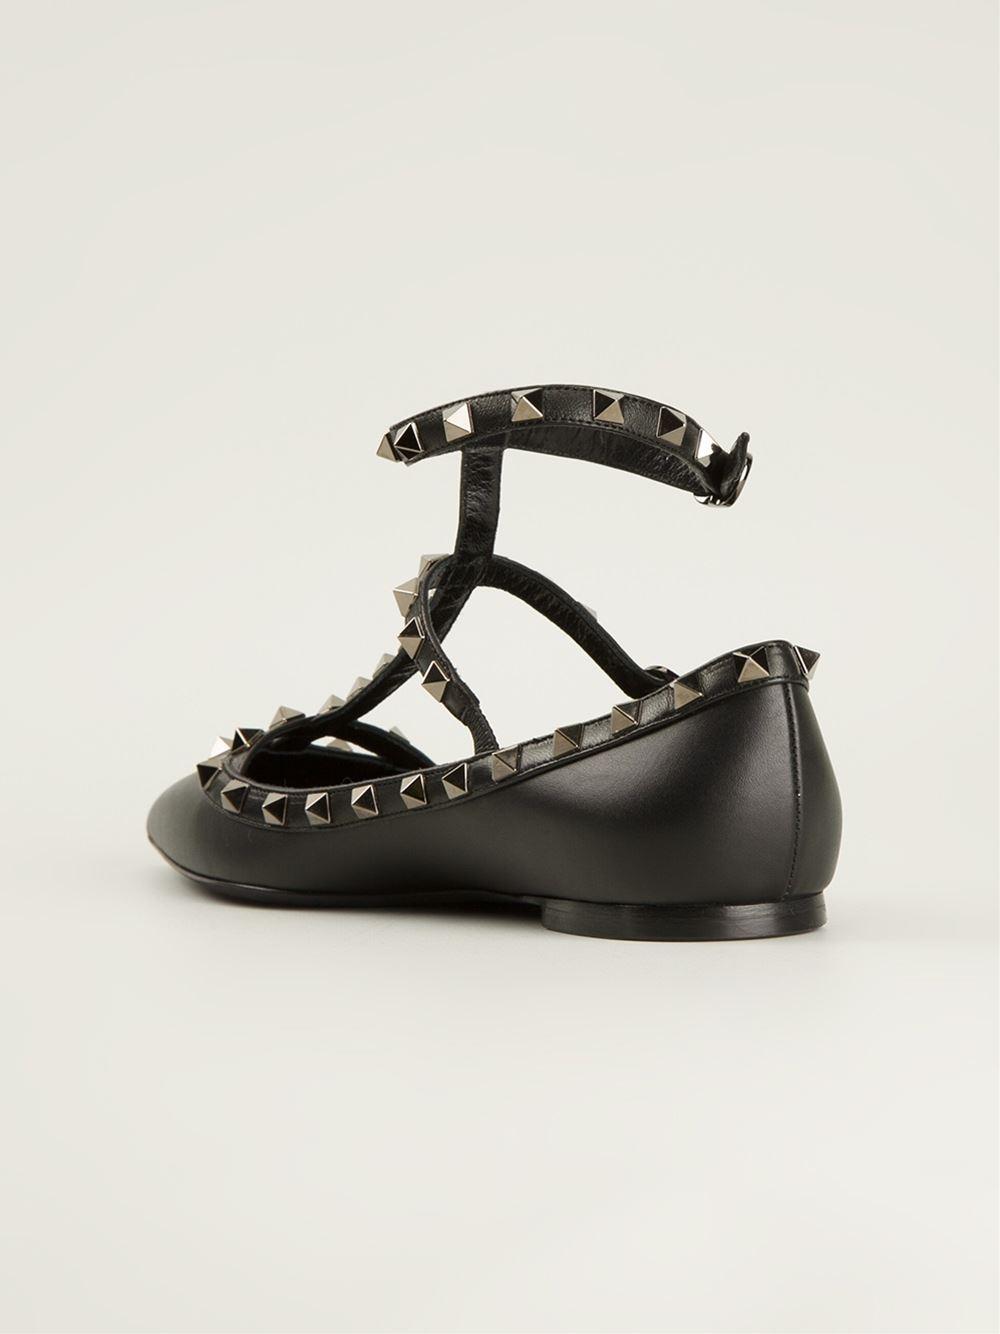 valentino 39 rockstud noir 39 ballerinas in black lyst. Black Bedroom Furniture Sets. Home Design Ideas